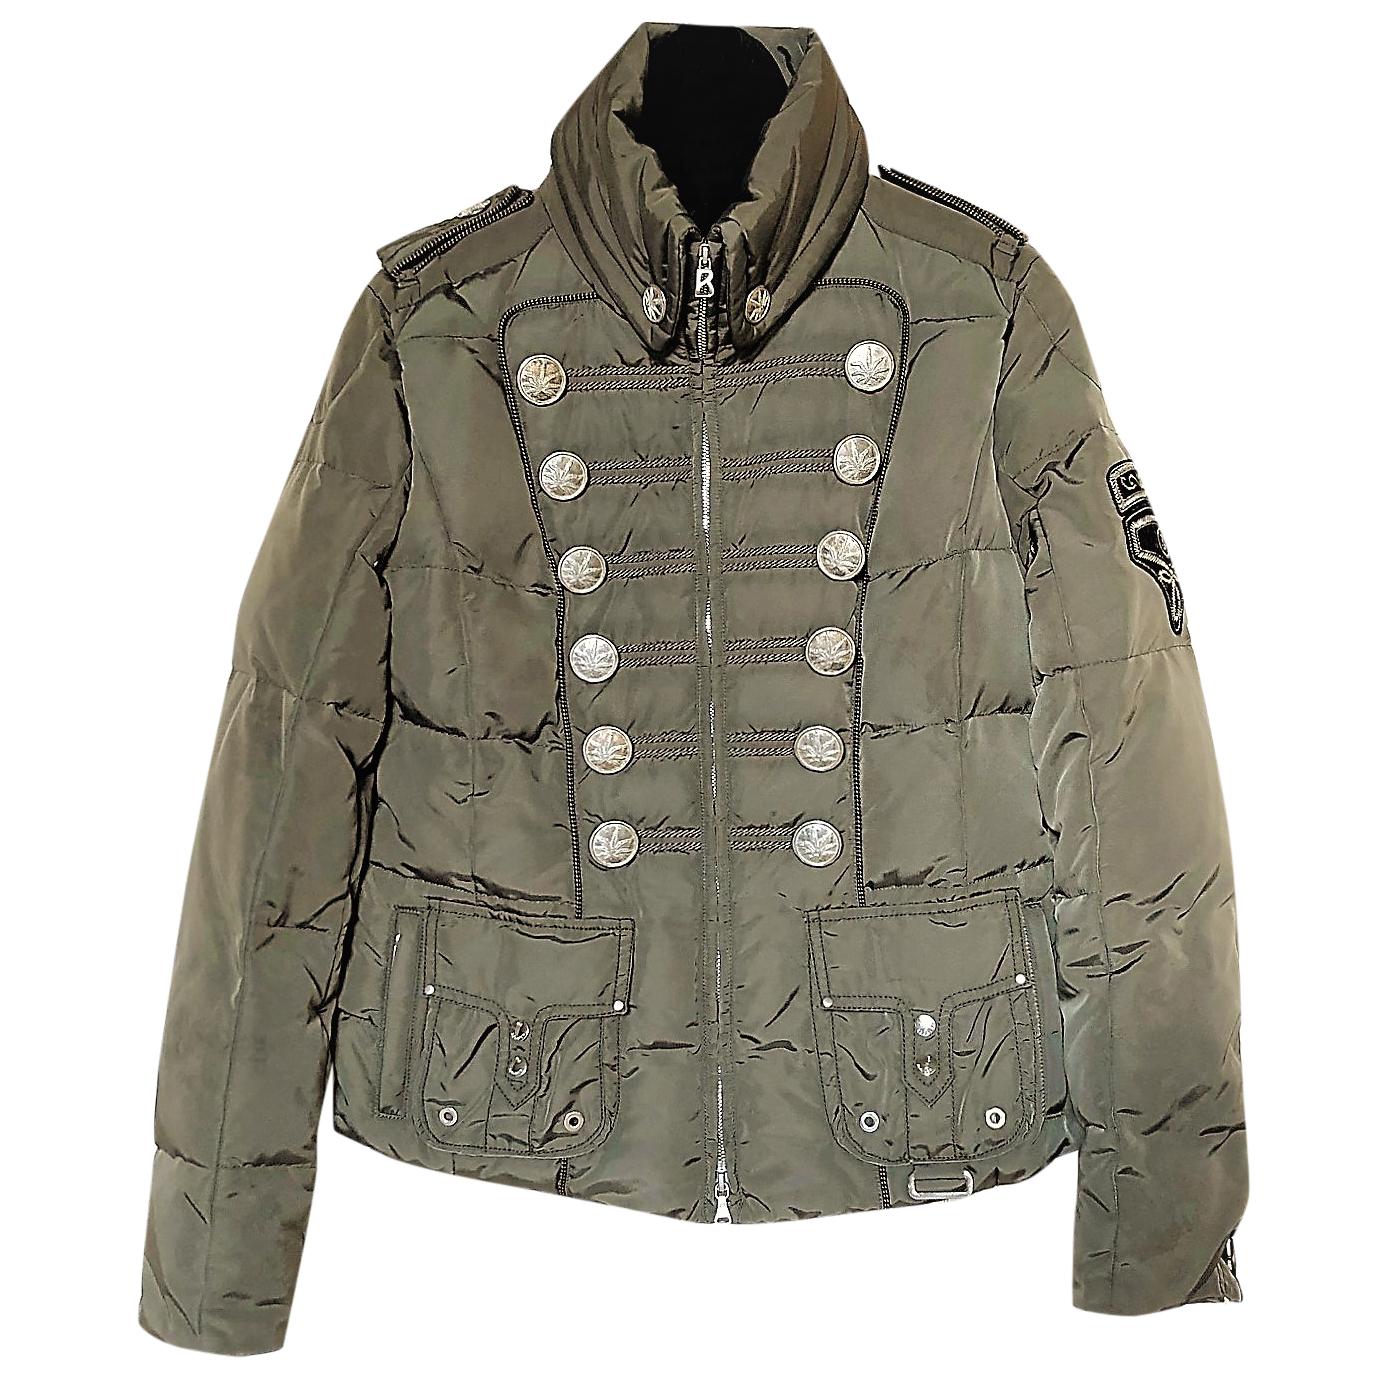 608e3bbedf0 Bogner Khaki Quilted Ski Jacket | HEWI London